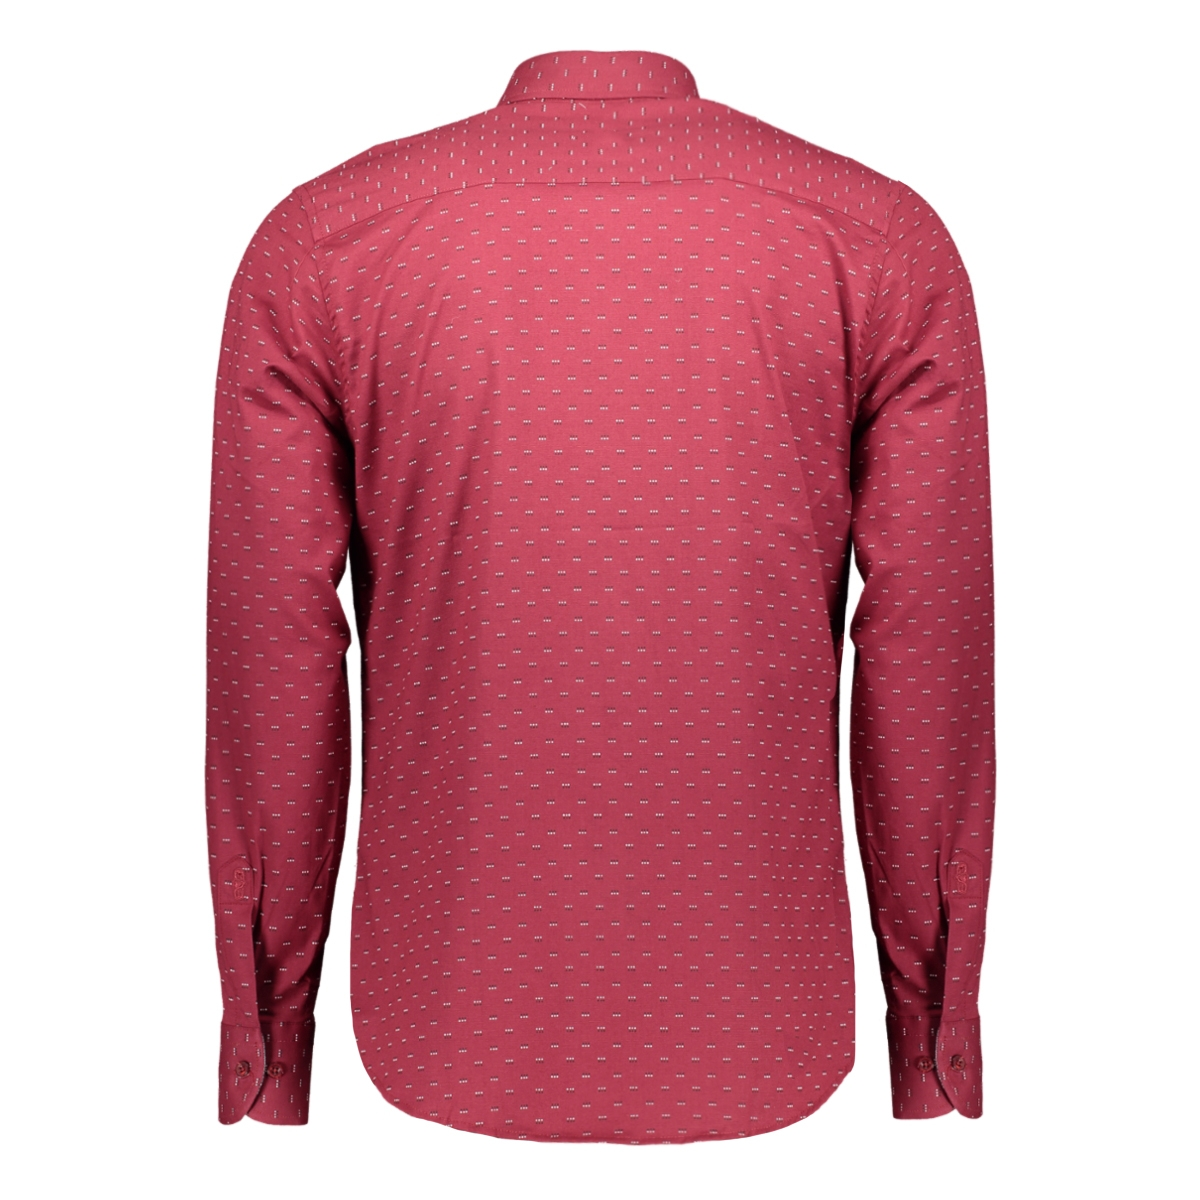 32598 gabbiano overhemd bordo (v1)